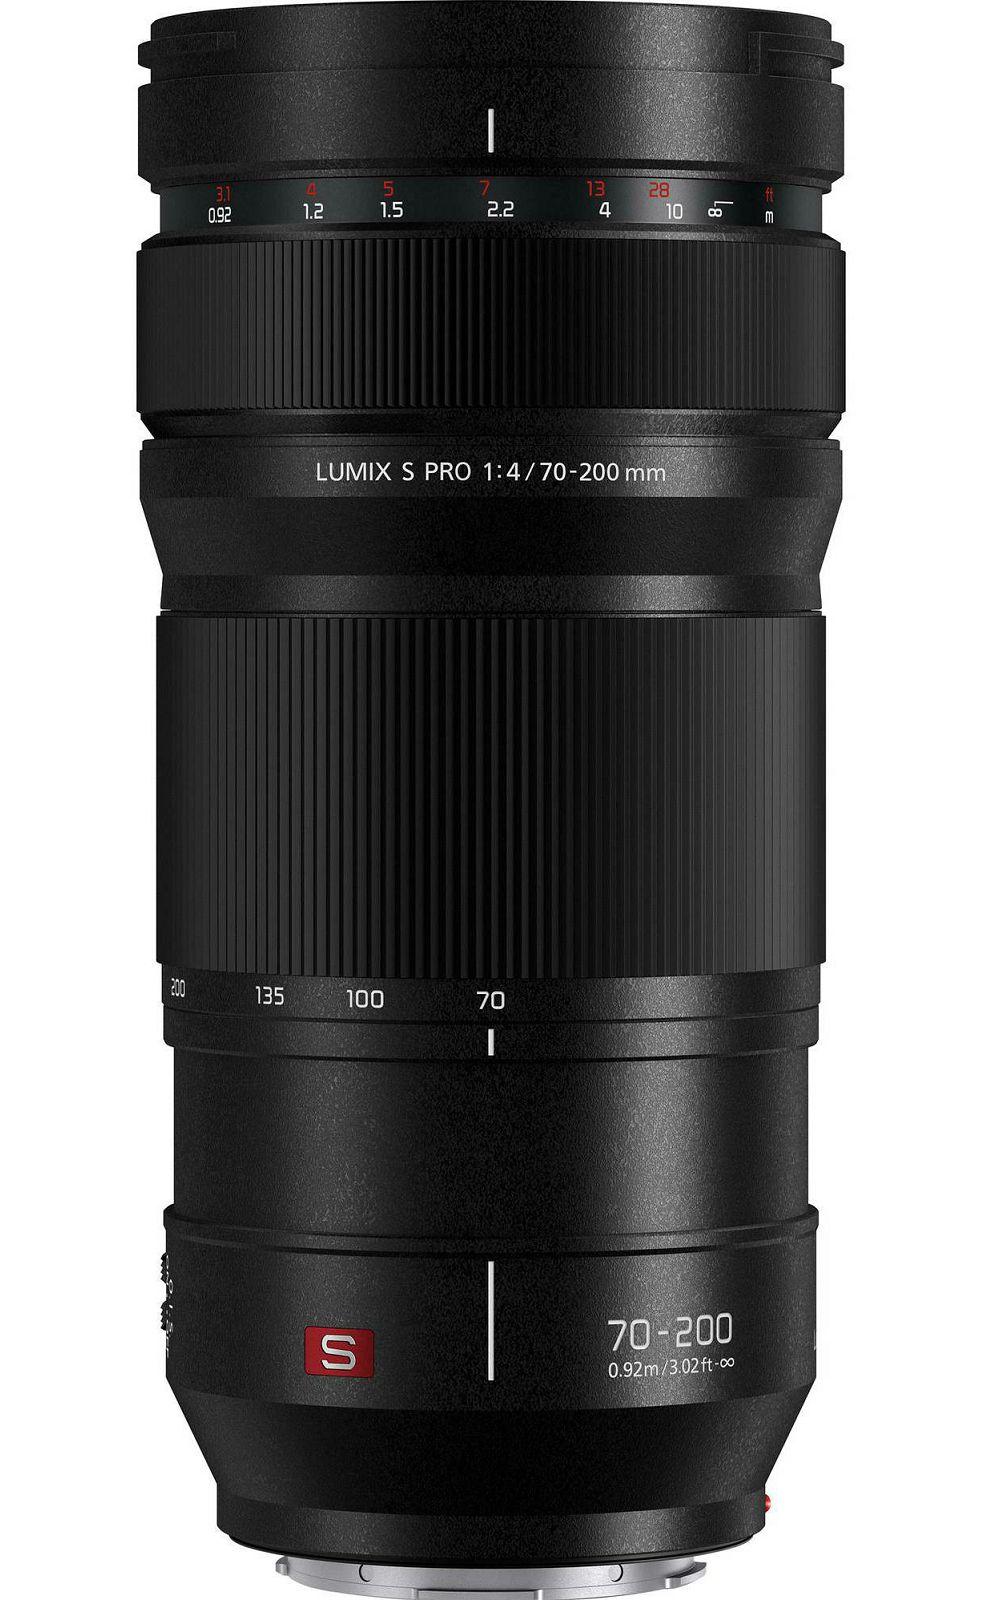 Panasonic Lumix S 70-200mm f/4 O.I.S. PRO telefoto objektiv (S-R70200E)